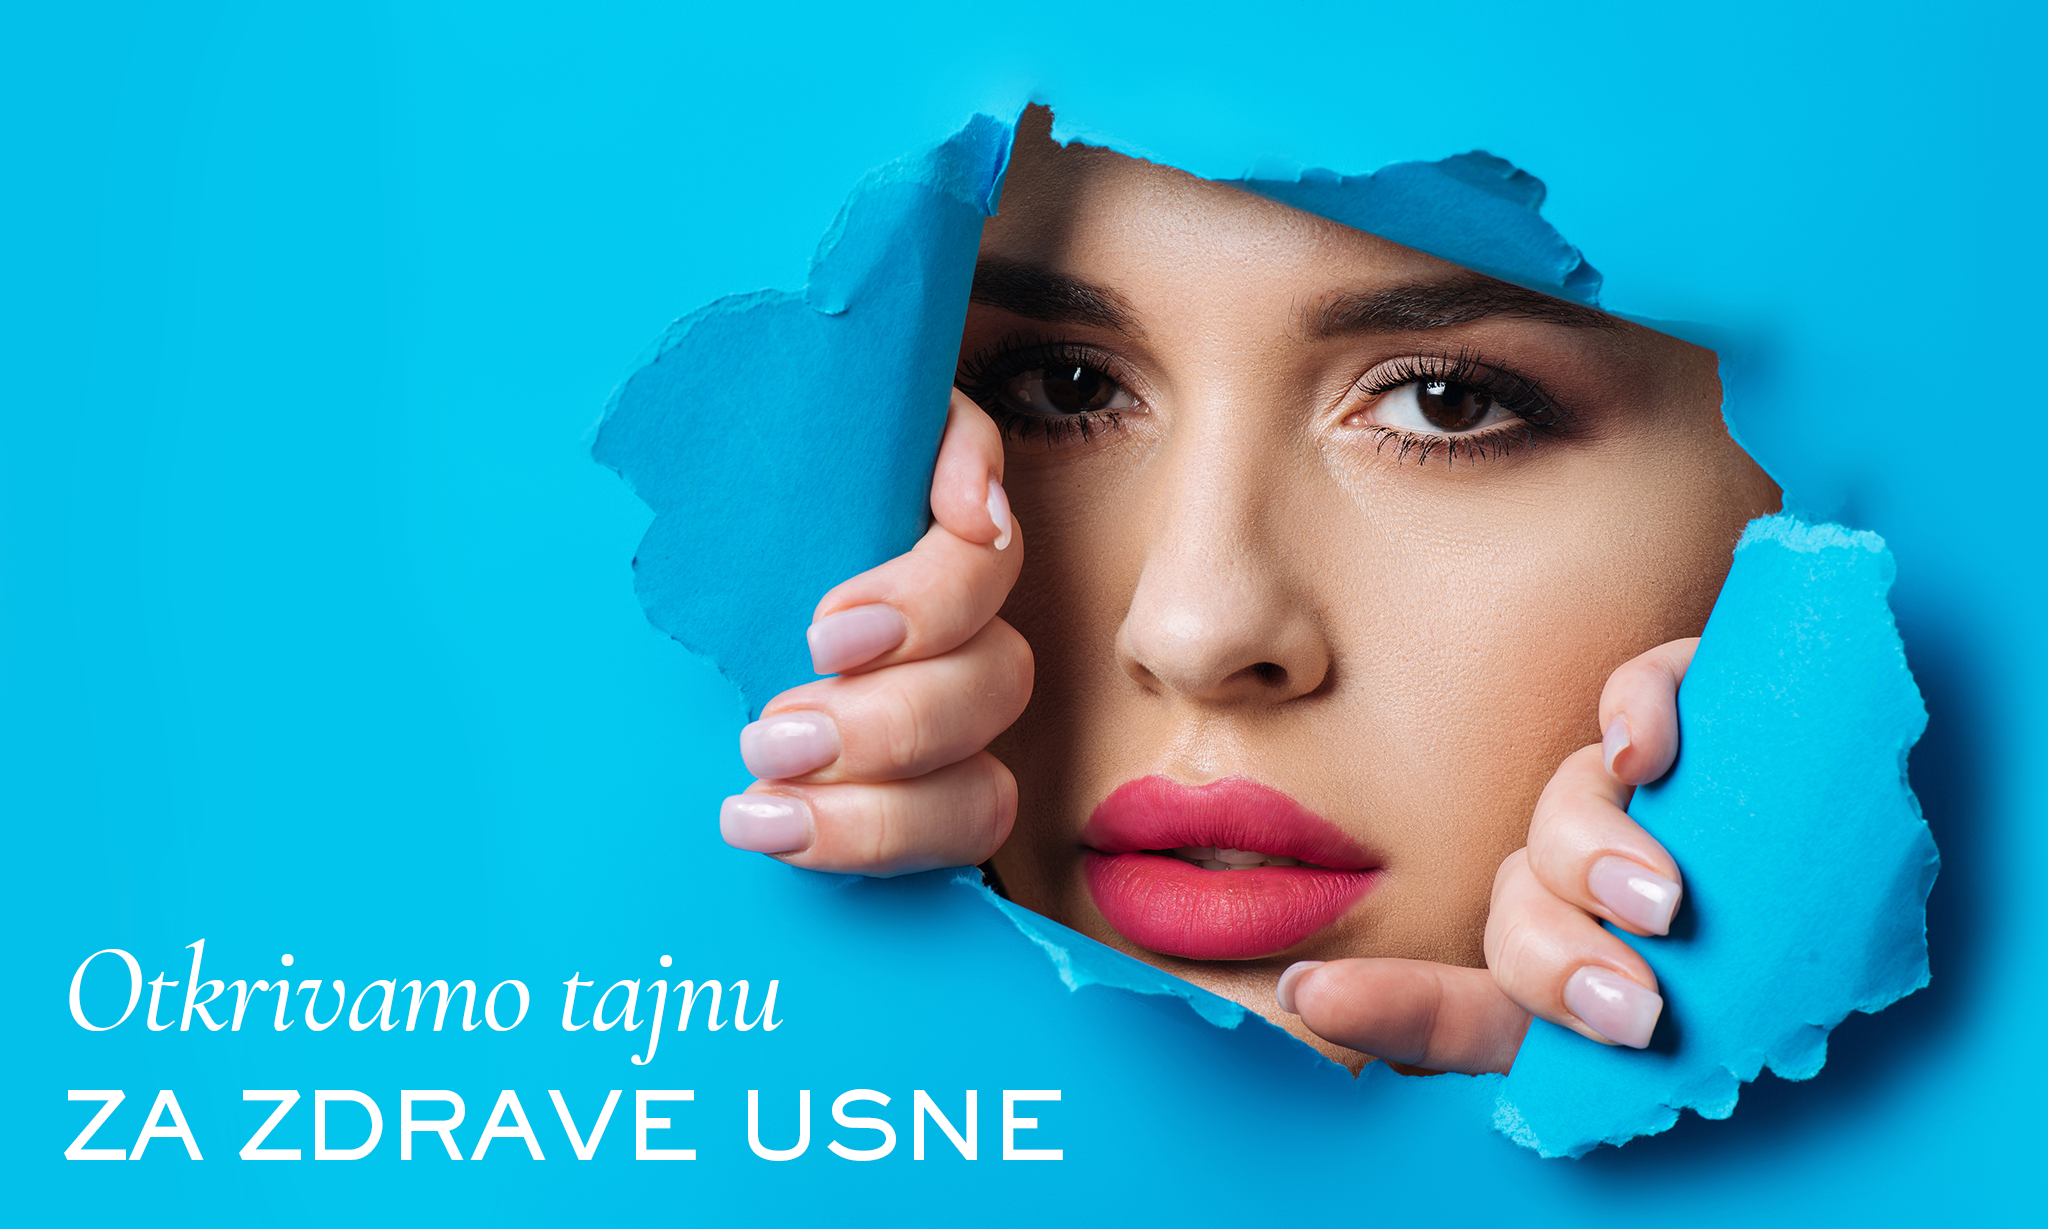 NUXE ima za vas TOP 5 saveta za zdrave usne i super poklone!